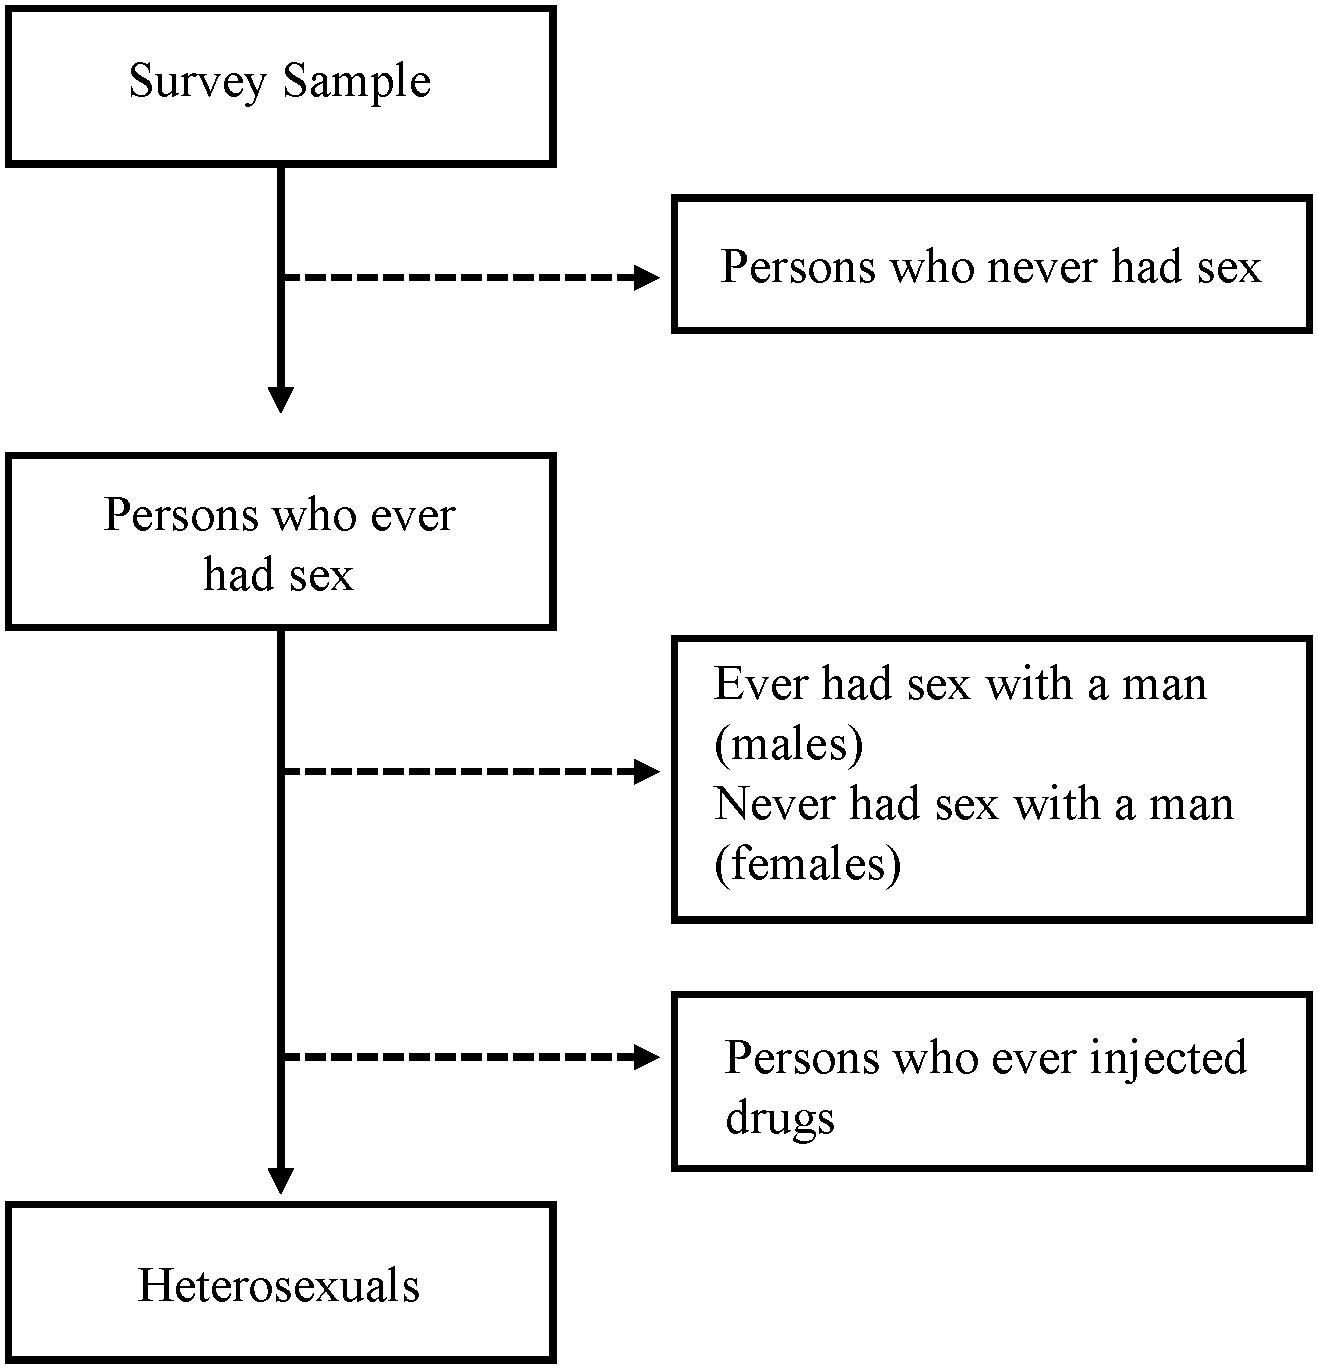 Heterosexual definition images